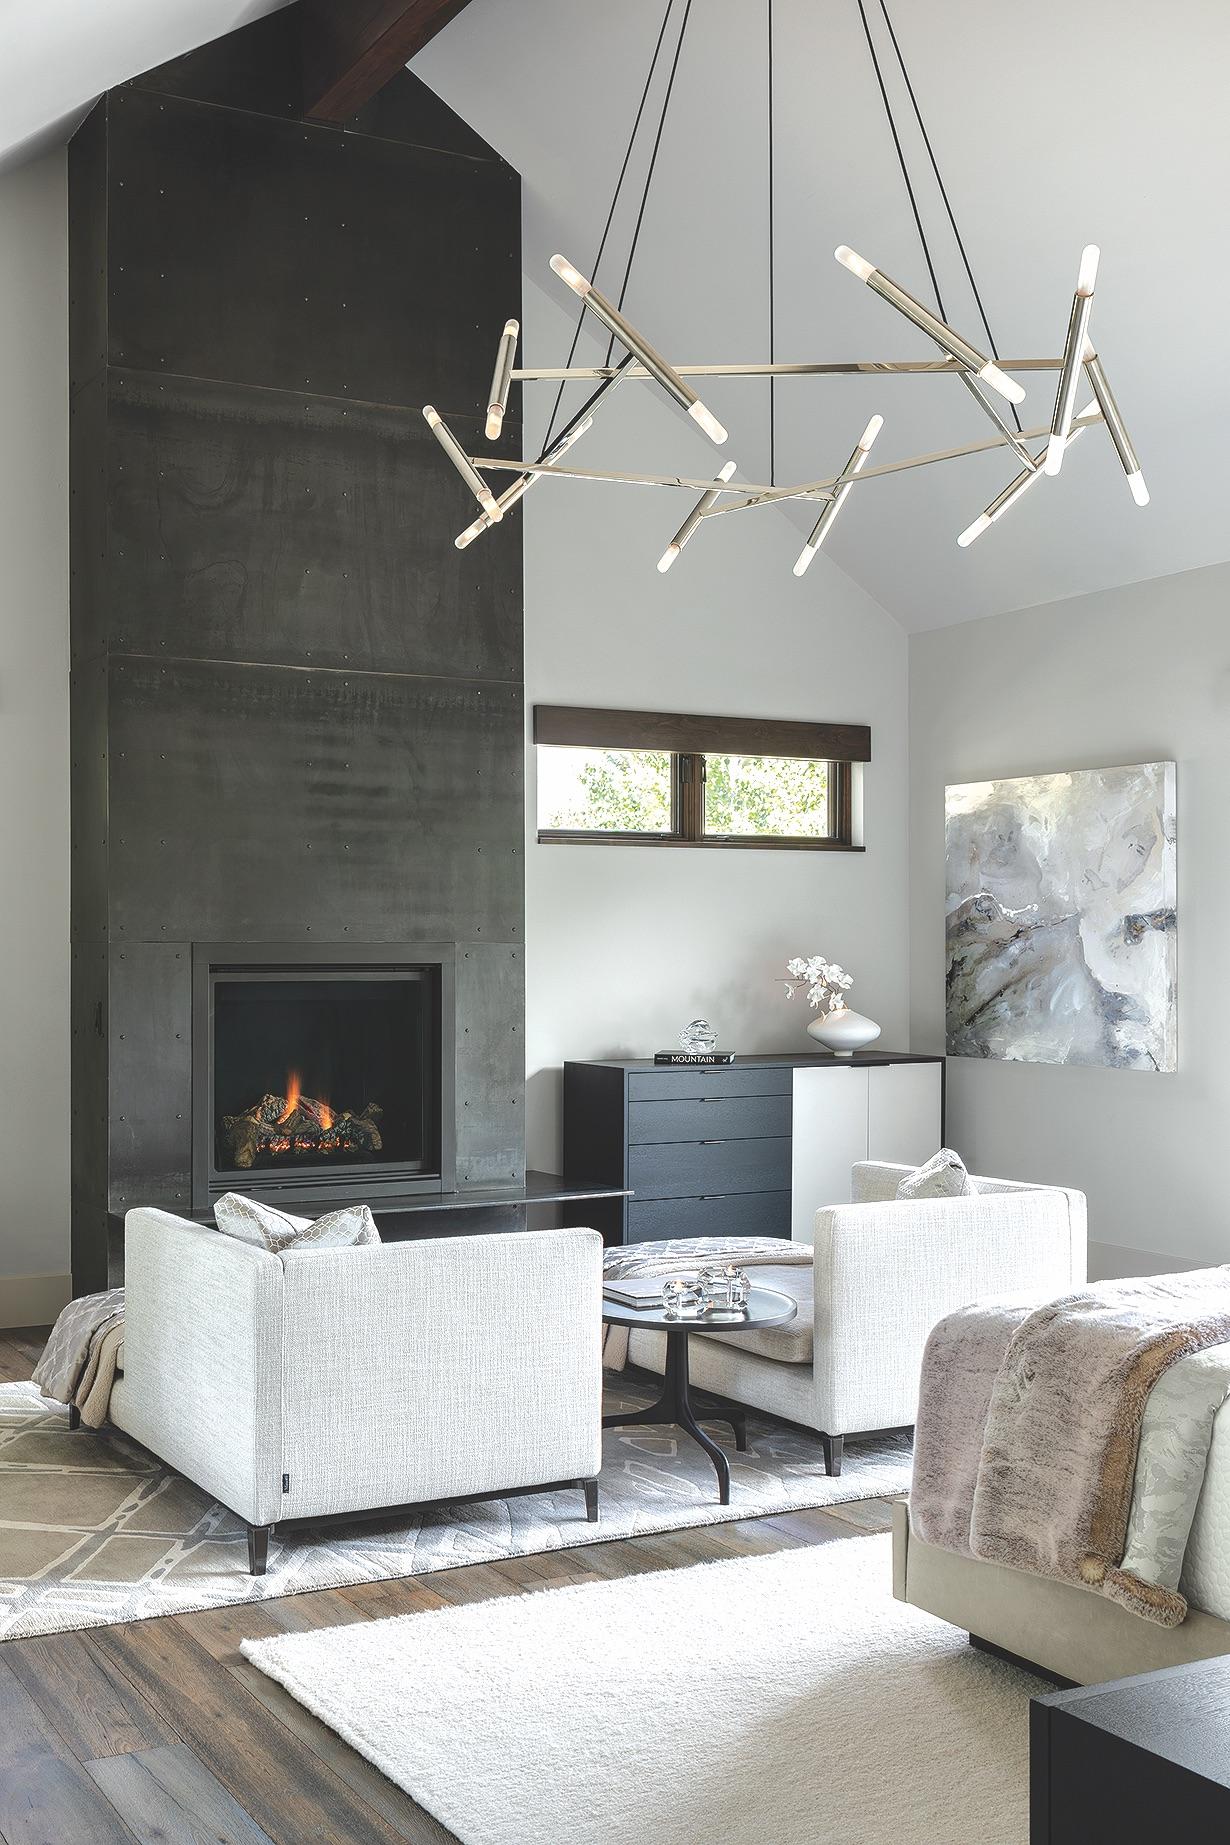 Interiors Fire